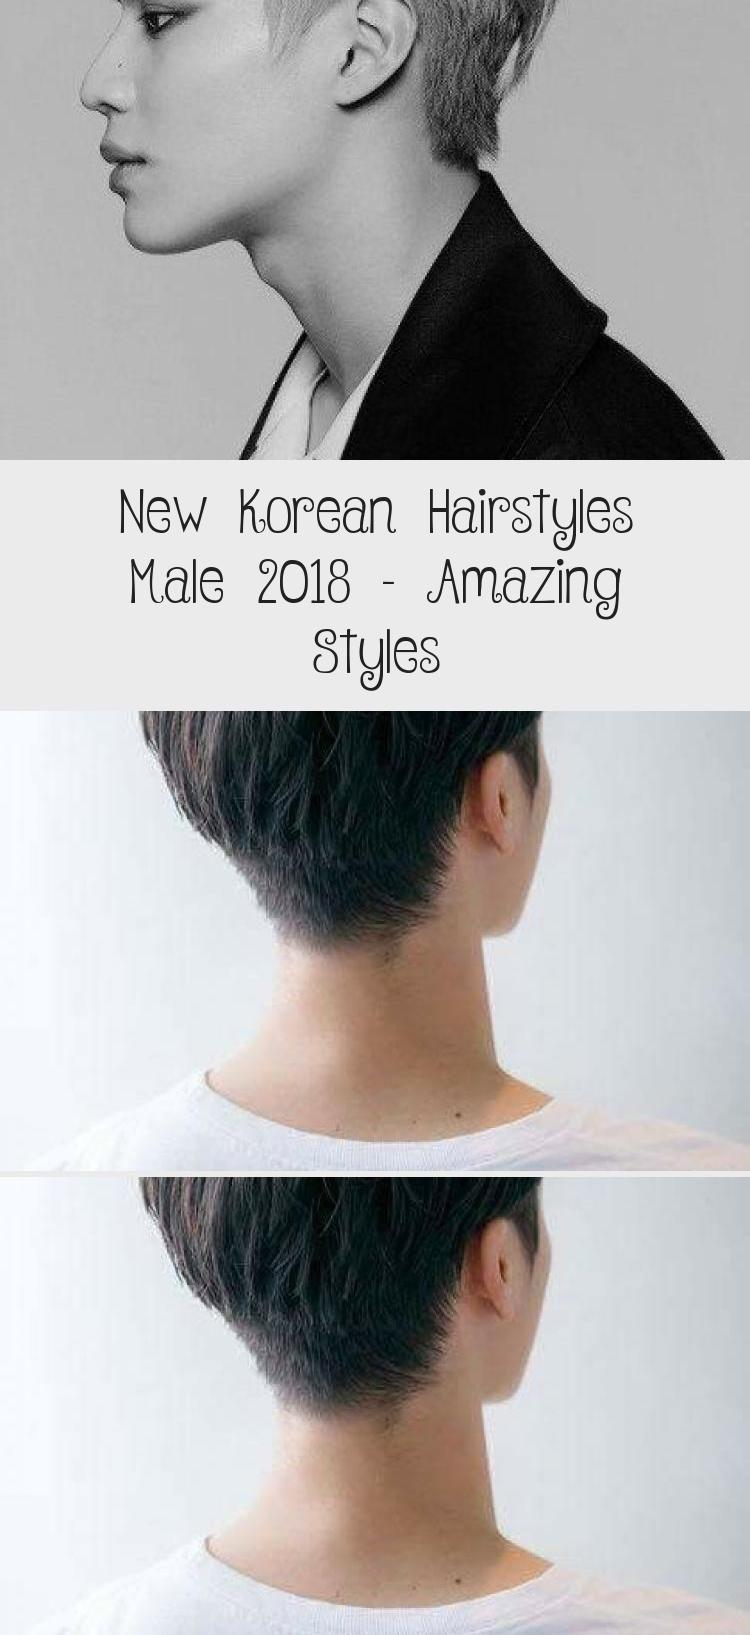 New Korean Hairstyles Male 2018 – Amazing Styles - Pinokyo -  New Korean Hairstyles Male 2018 – Amazing styles #  - #Amazing #brideHairstyles #hairlookHairstyles #hairstyles #Hairstylescorto #Hairstylesforwork #Hairstyleskorean #Hairstylesrecogido #Korean #Male #partyHairstyles #Pinokyo #Styles #summerHairstyles